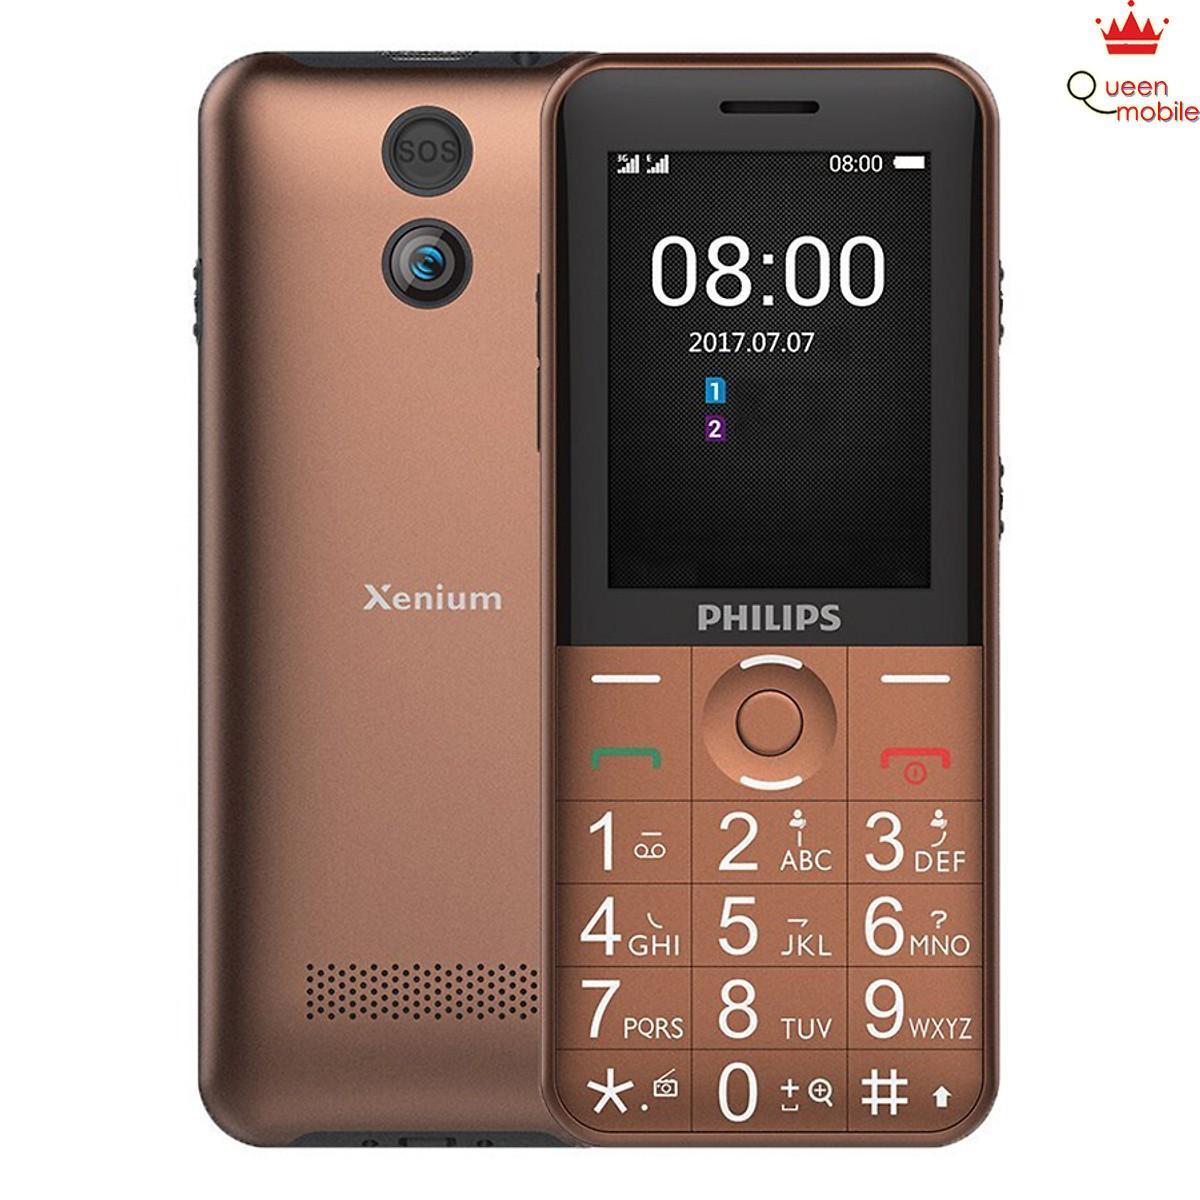 Điện Thoại Philips Xenium E331